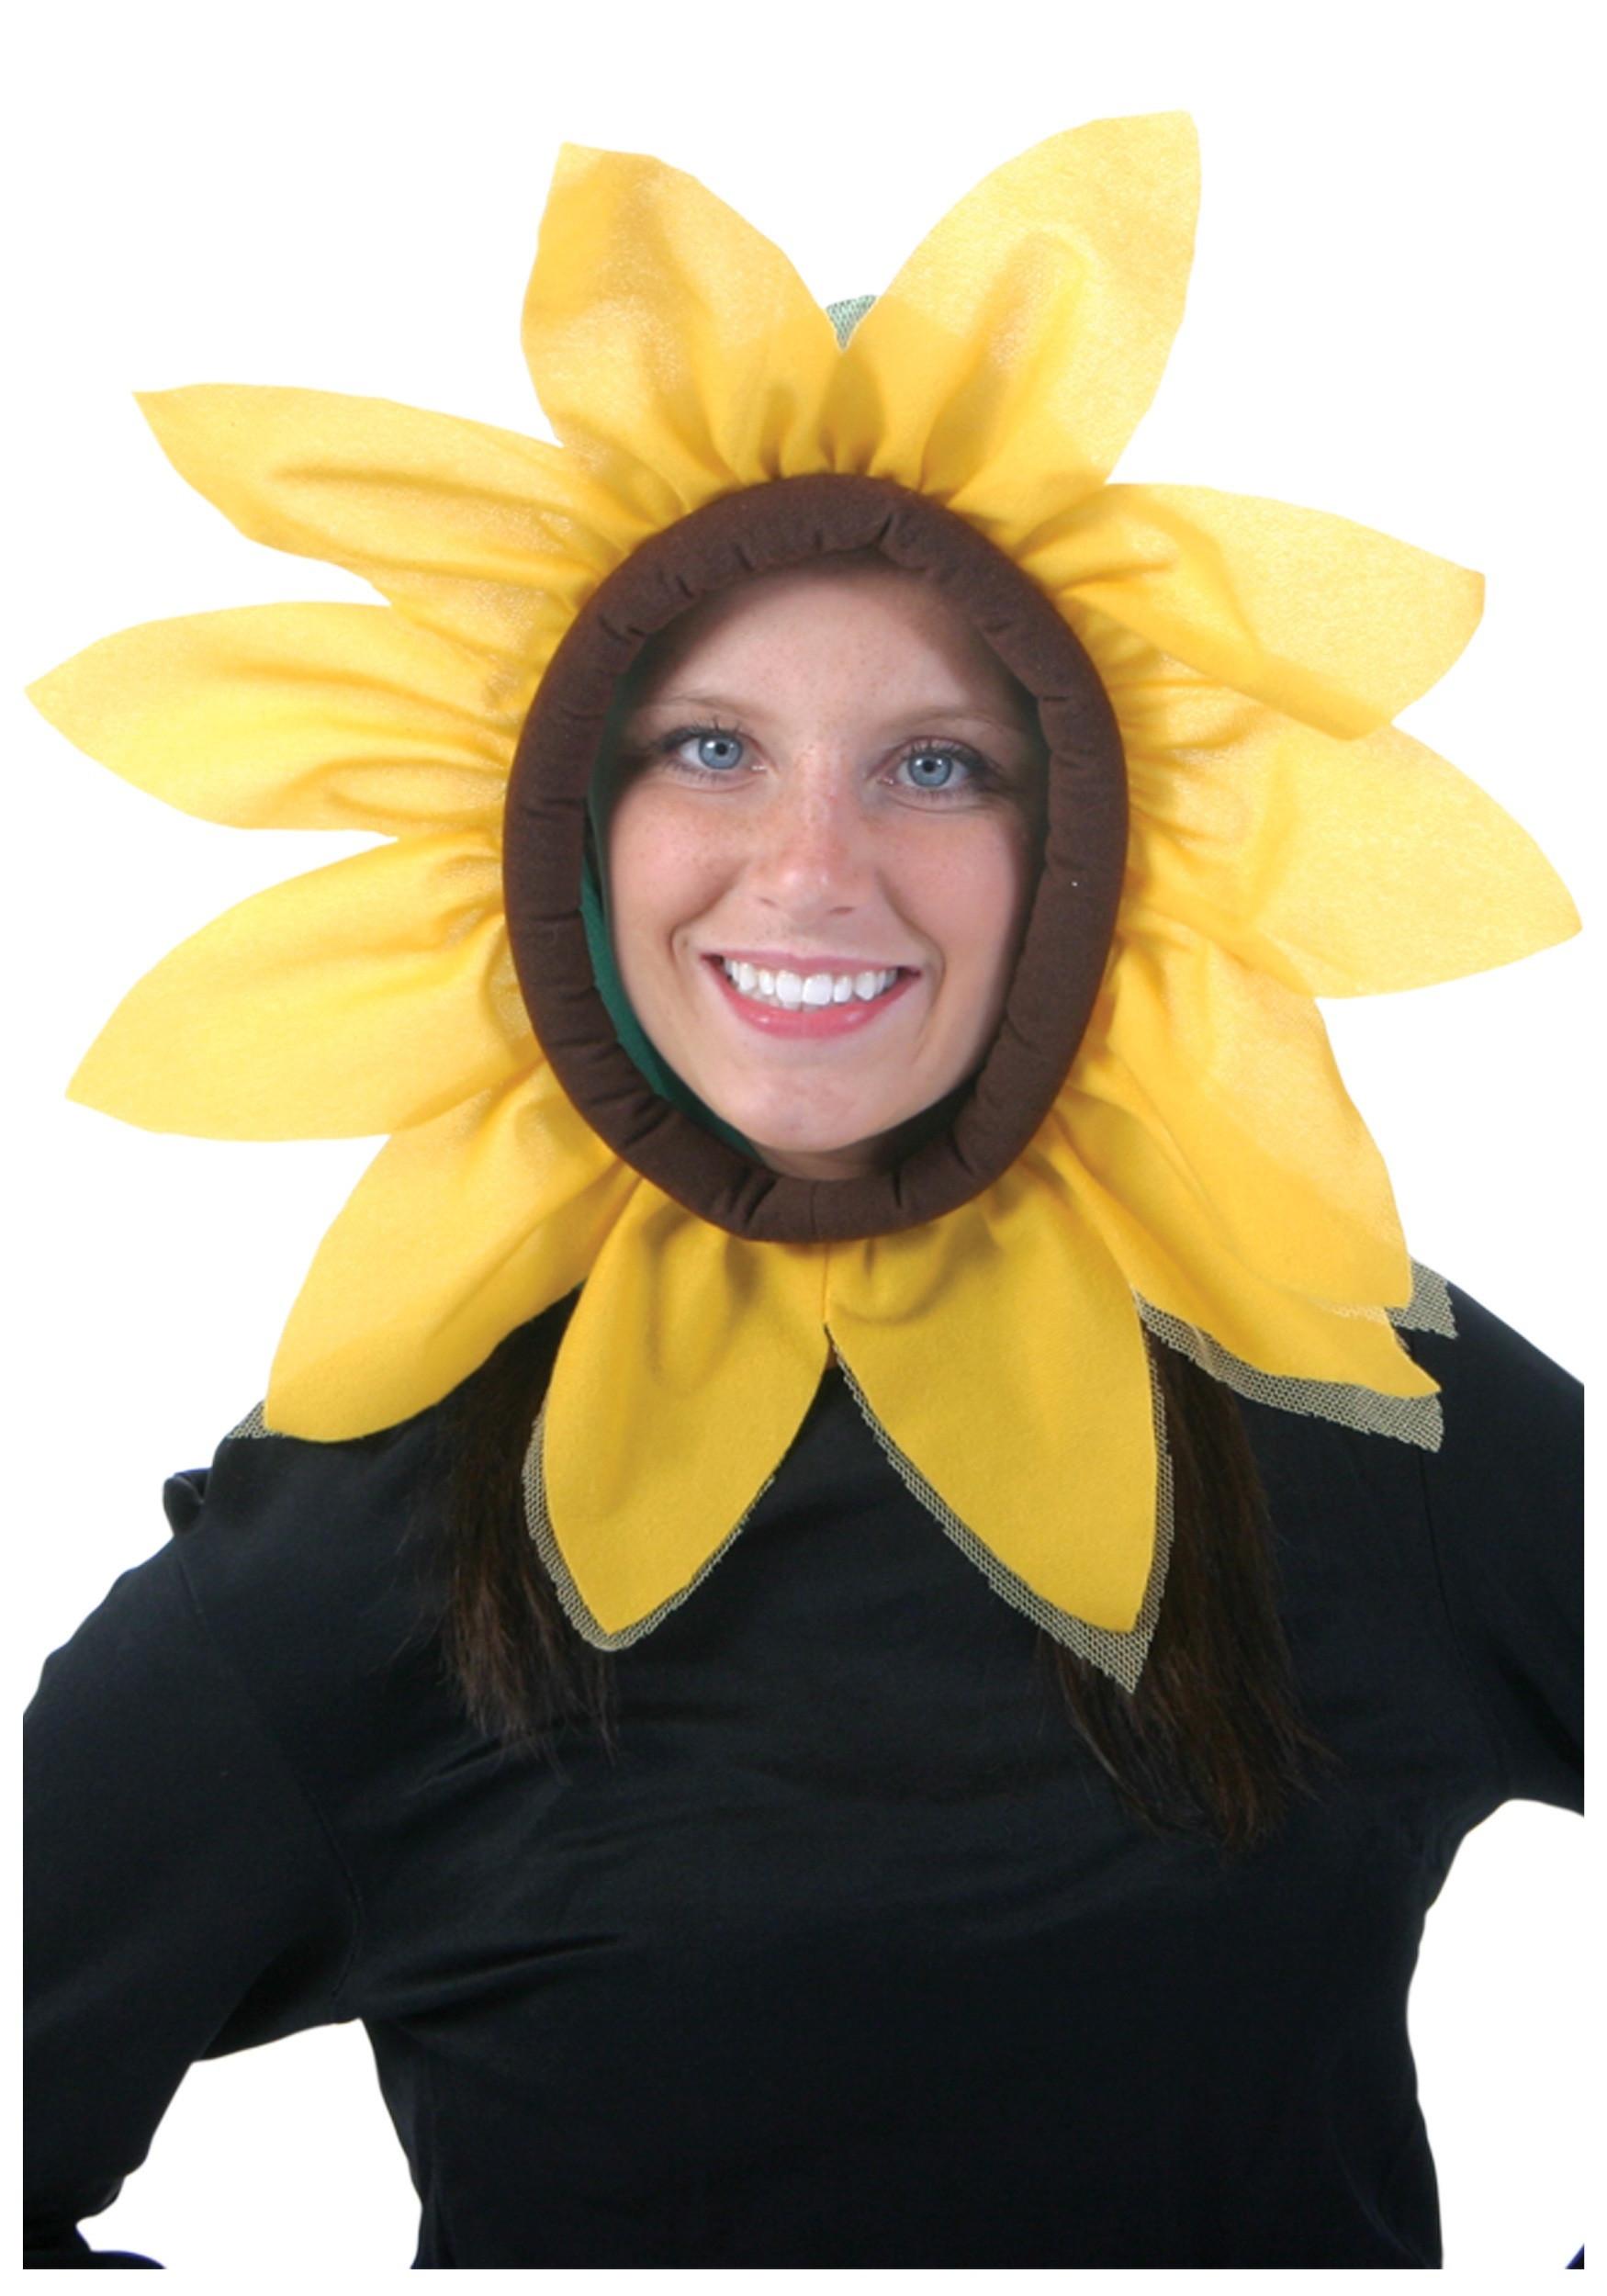 Flower Halloween Costume For Adults  Sunflower Hood